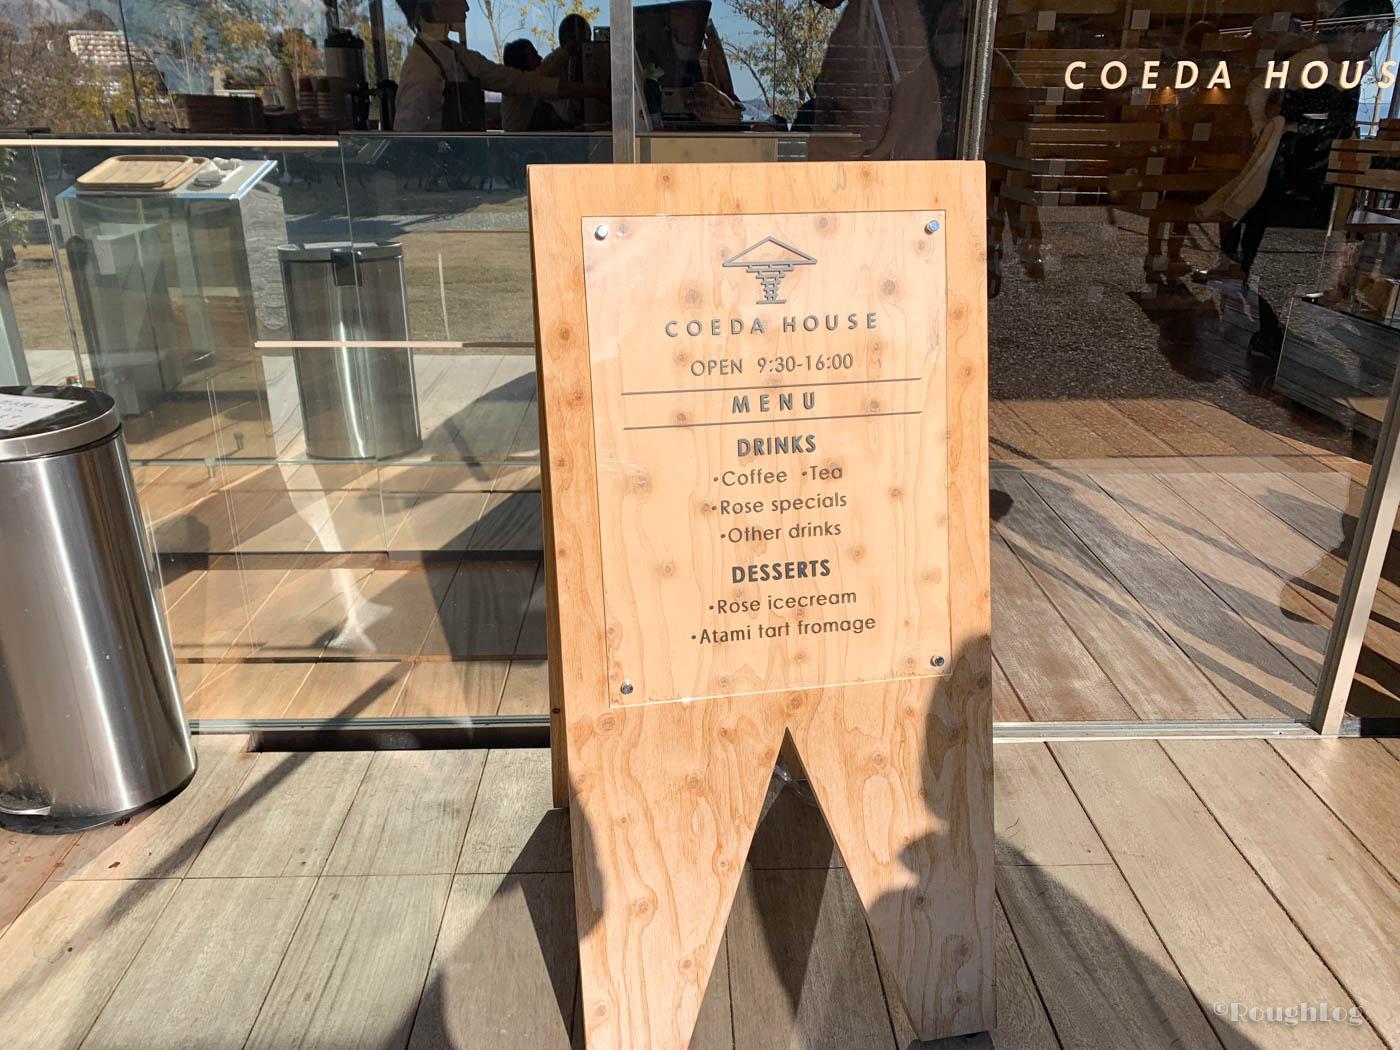 COEDA HOUSE(コエダハウス)の営業時間